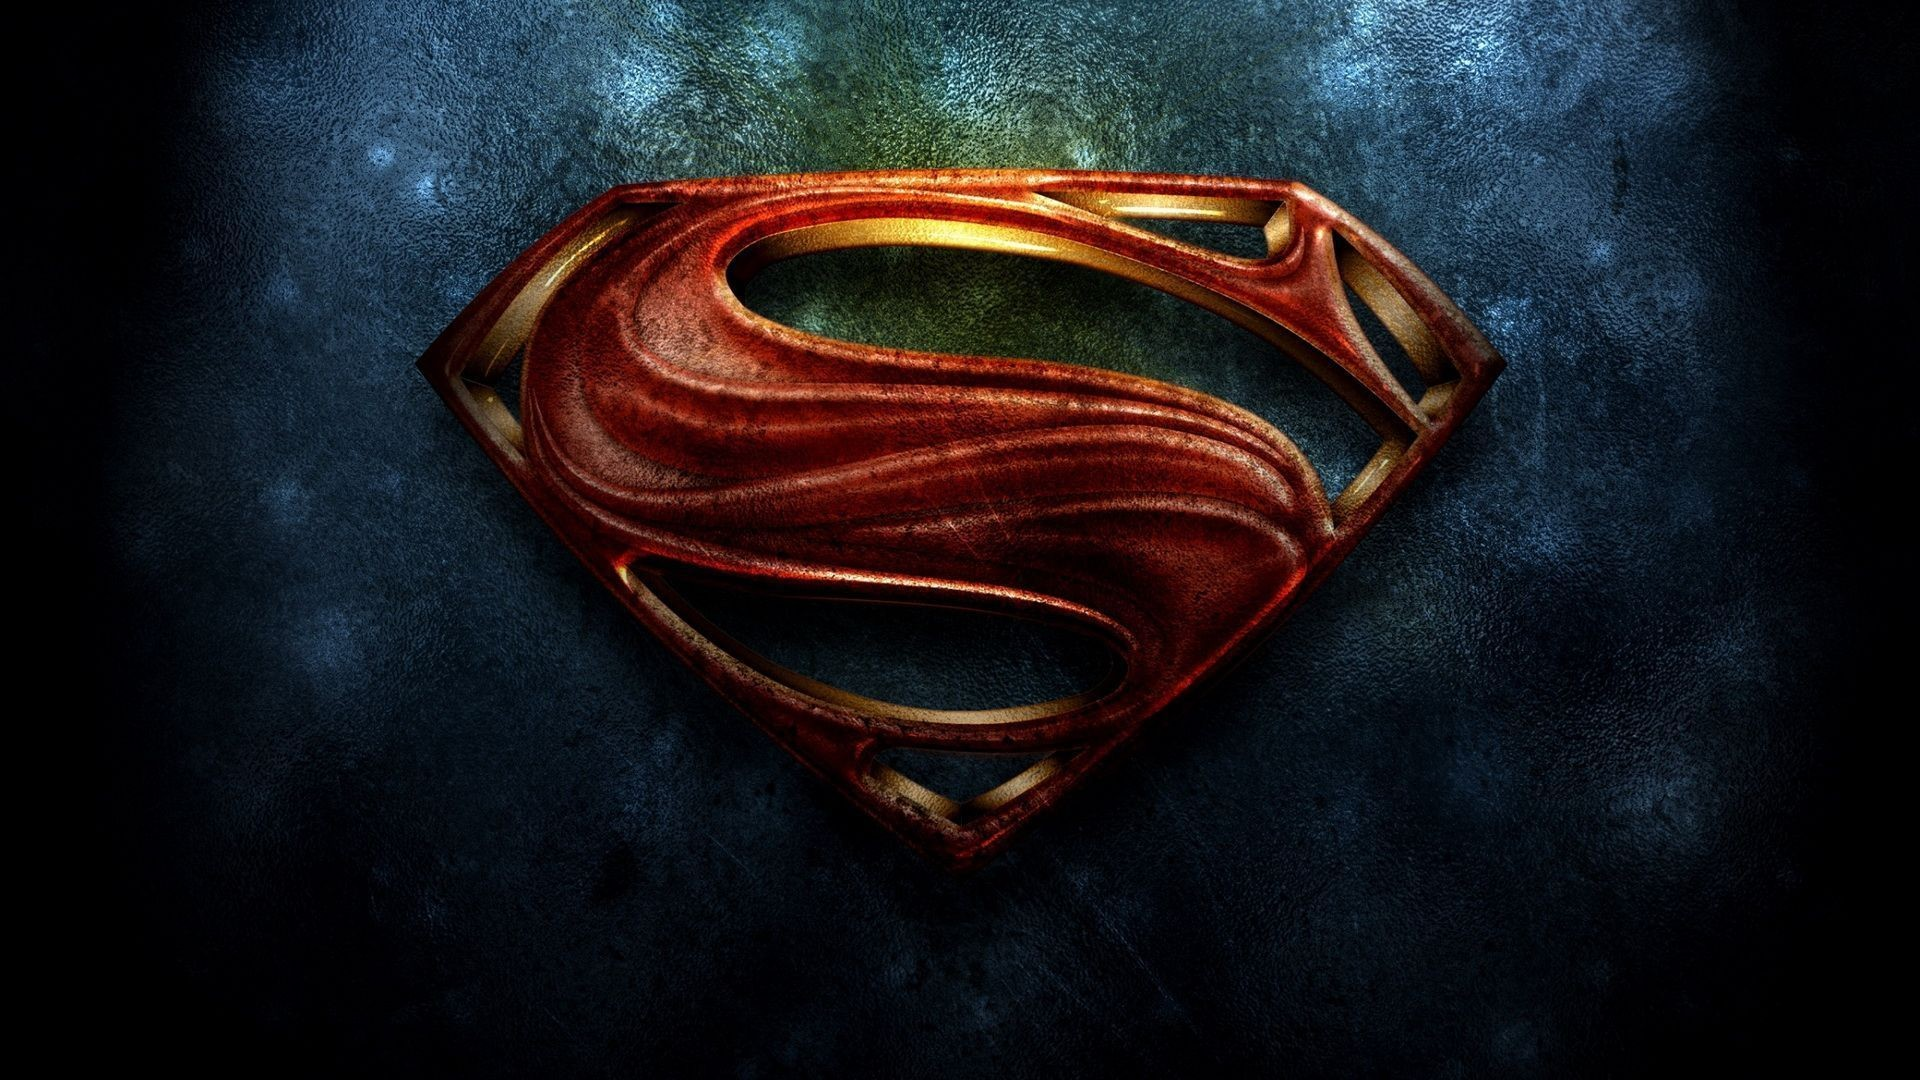 Comics Superman Wallpaper   Backgrounds + Desktop Wallpapers   Pinterest   Superman  wallpaper and Wallpaper